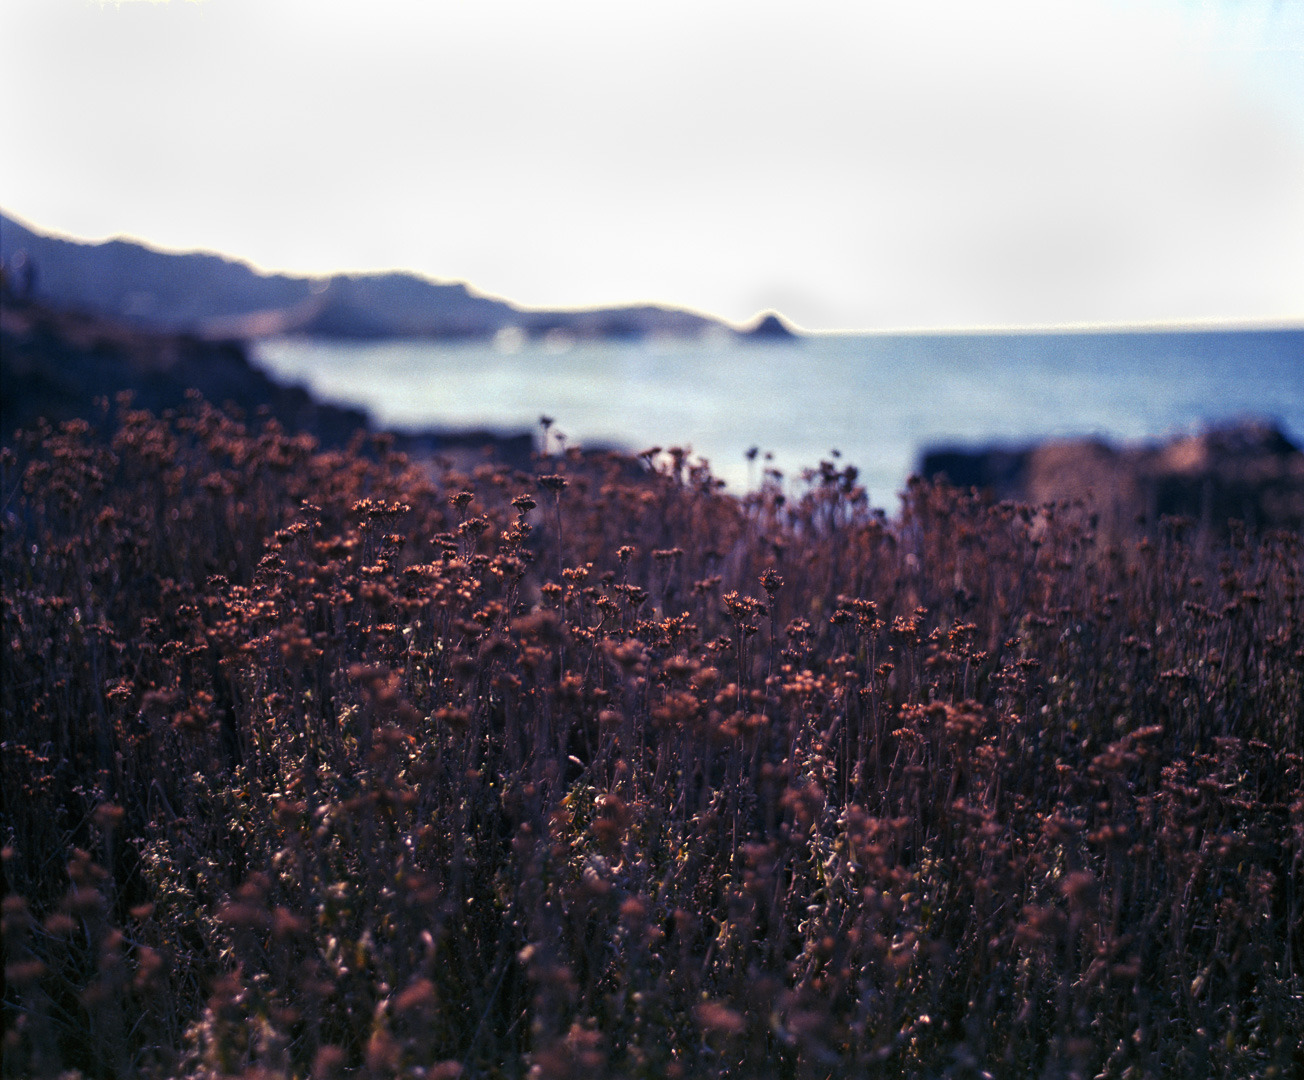 Pointlobos autumn lm4pcr